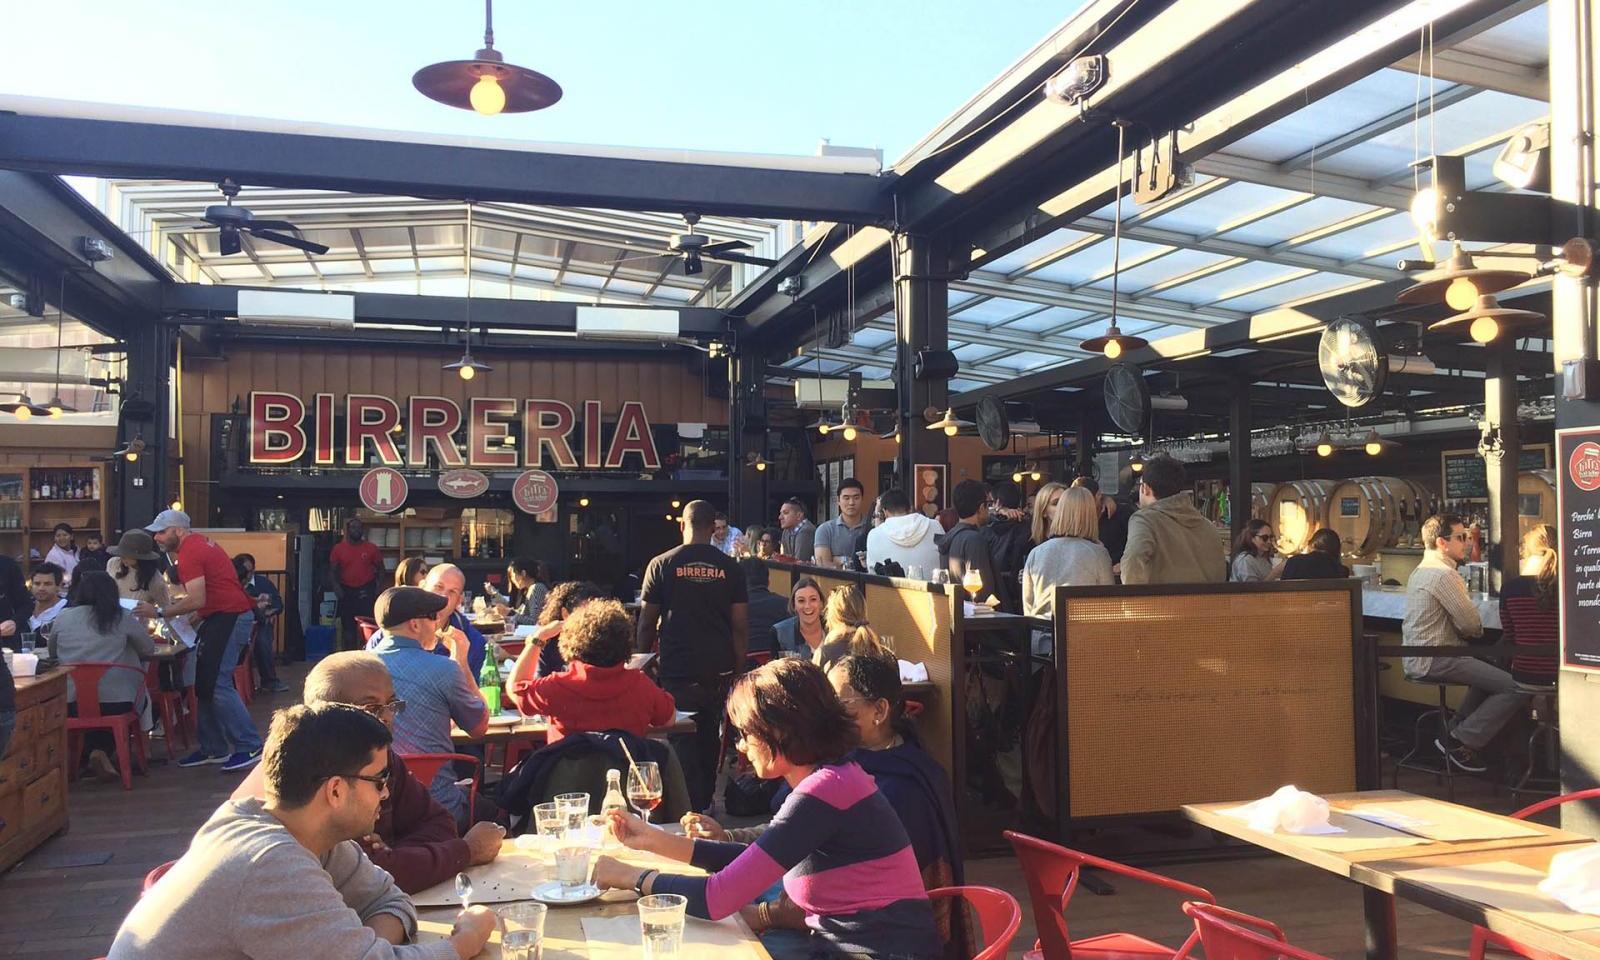 Birreria Rooftop Bar